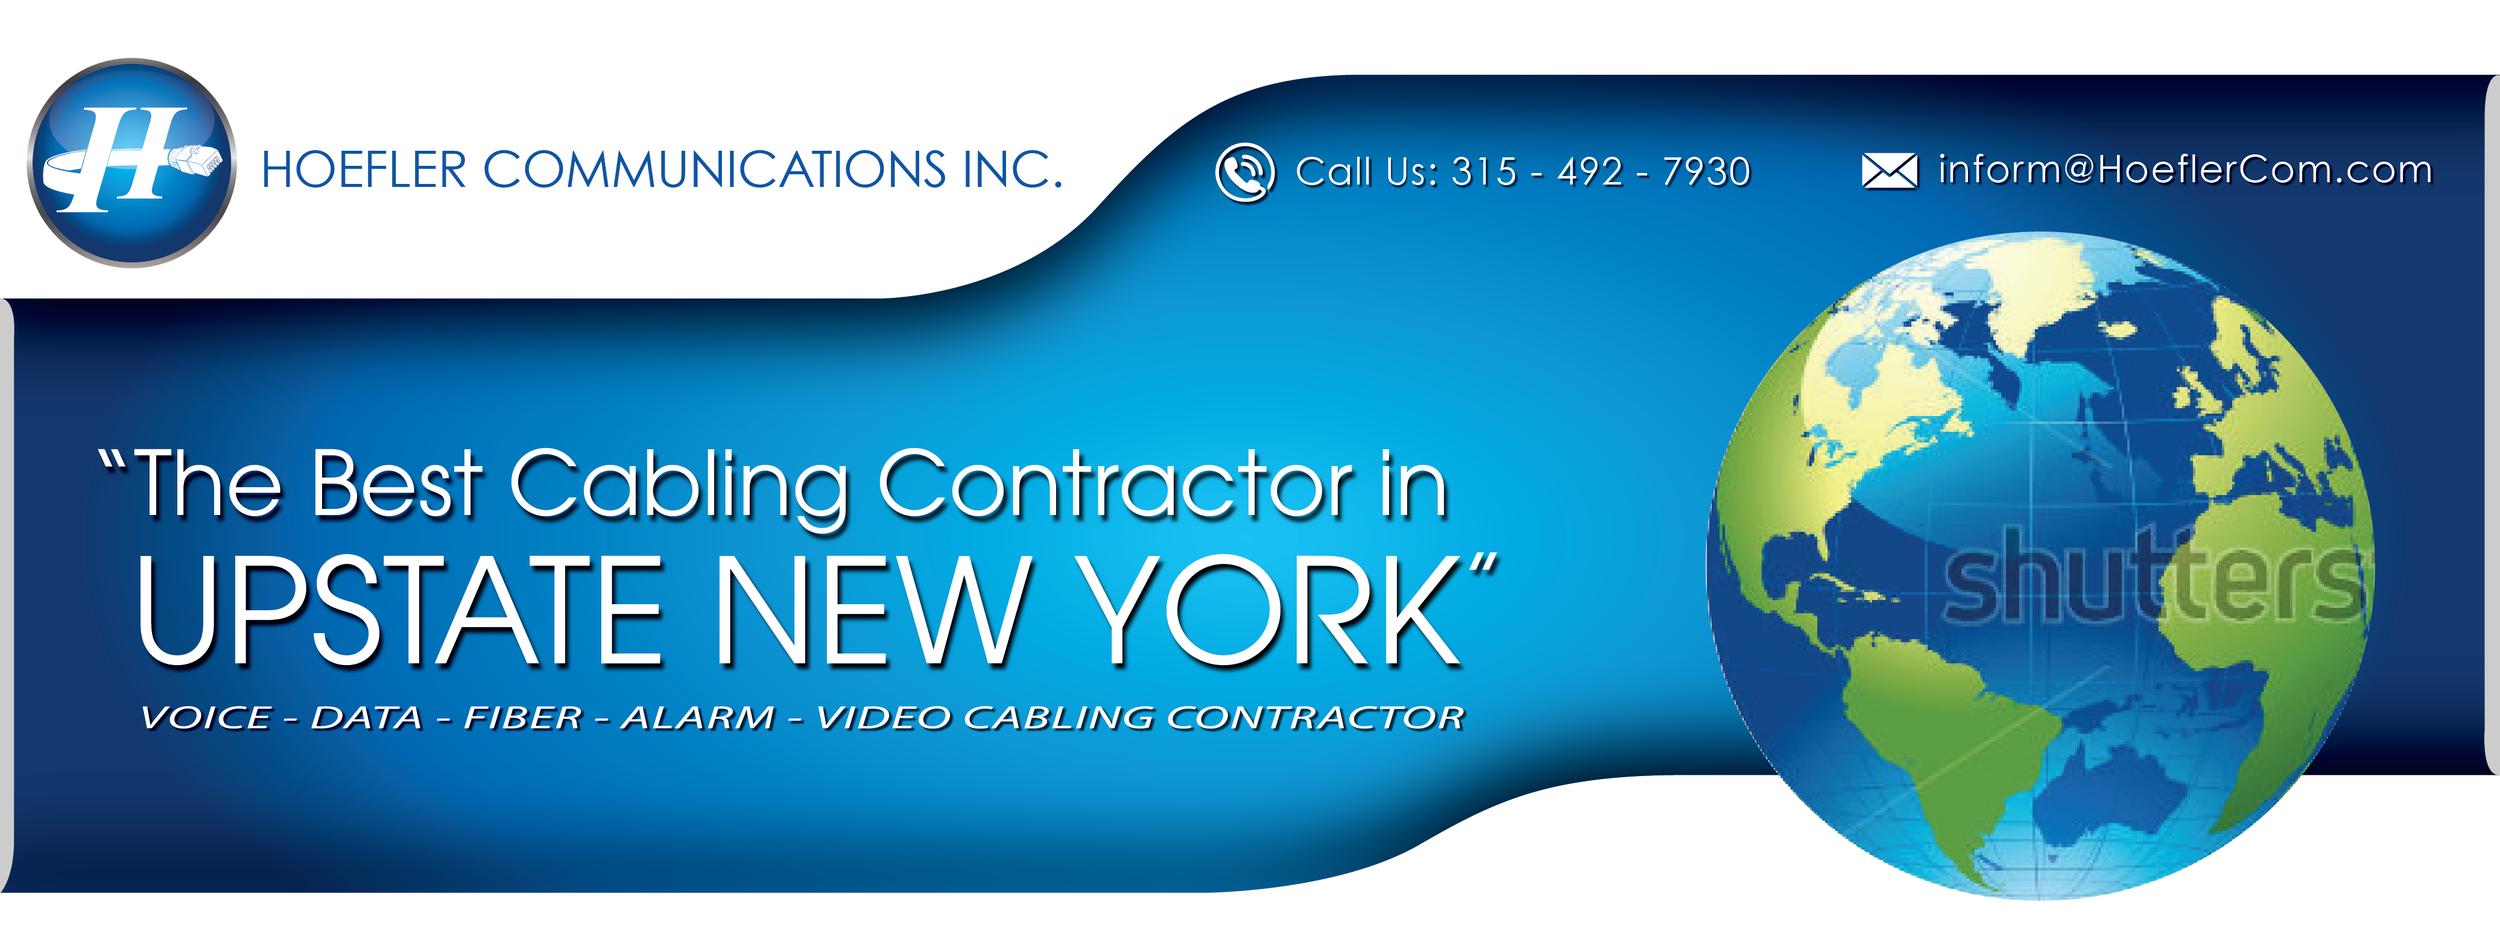 Contact Hoefler Communications Inc Mk 5894